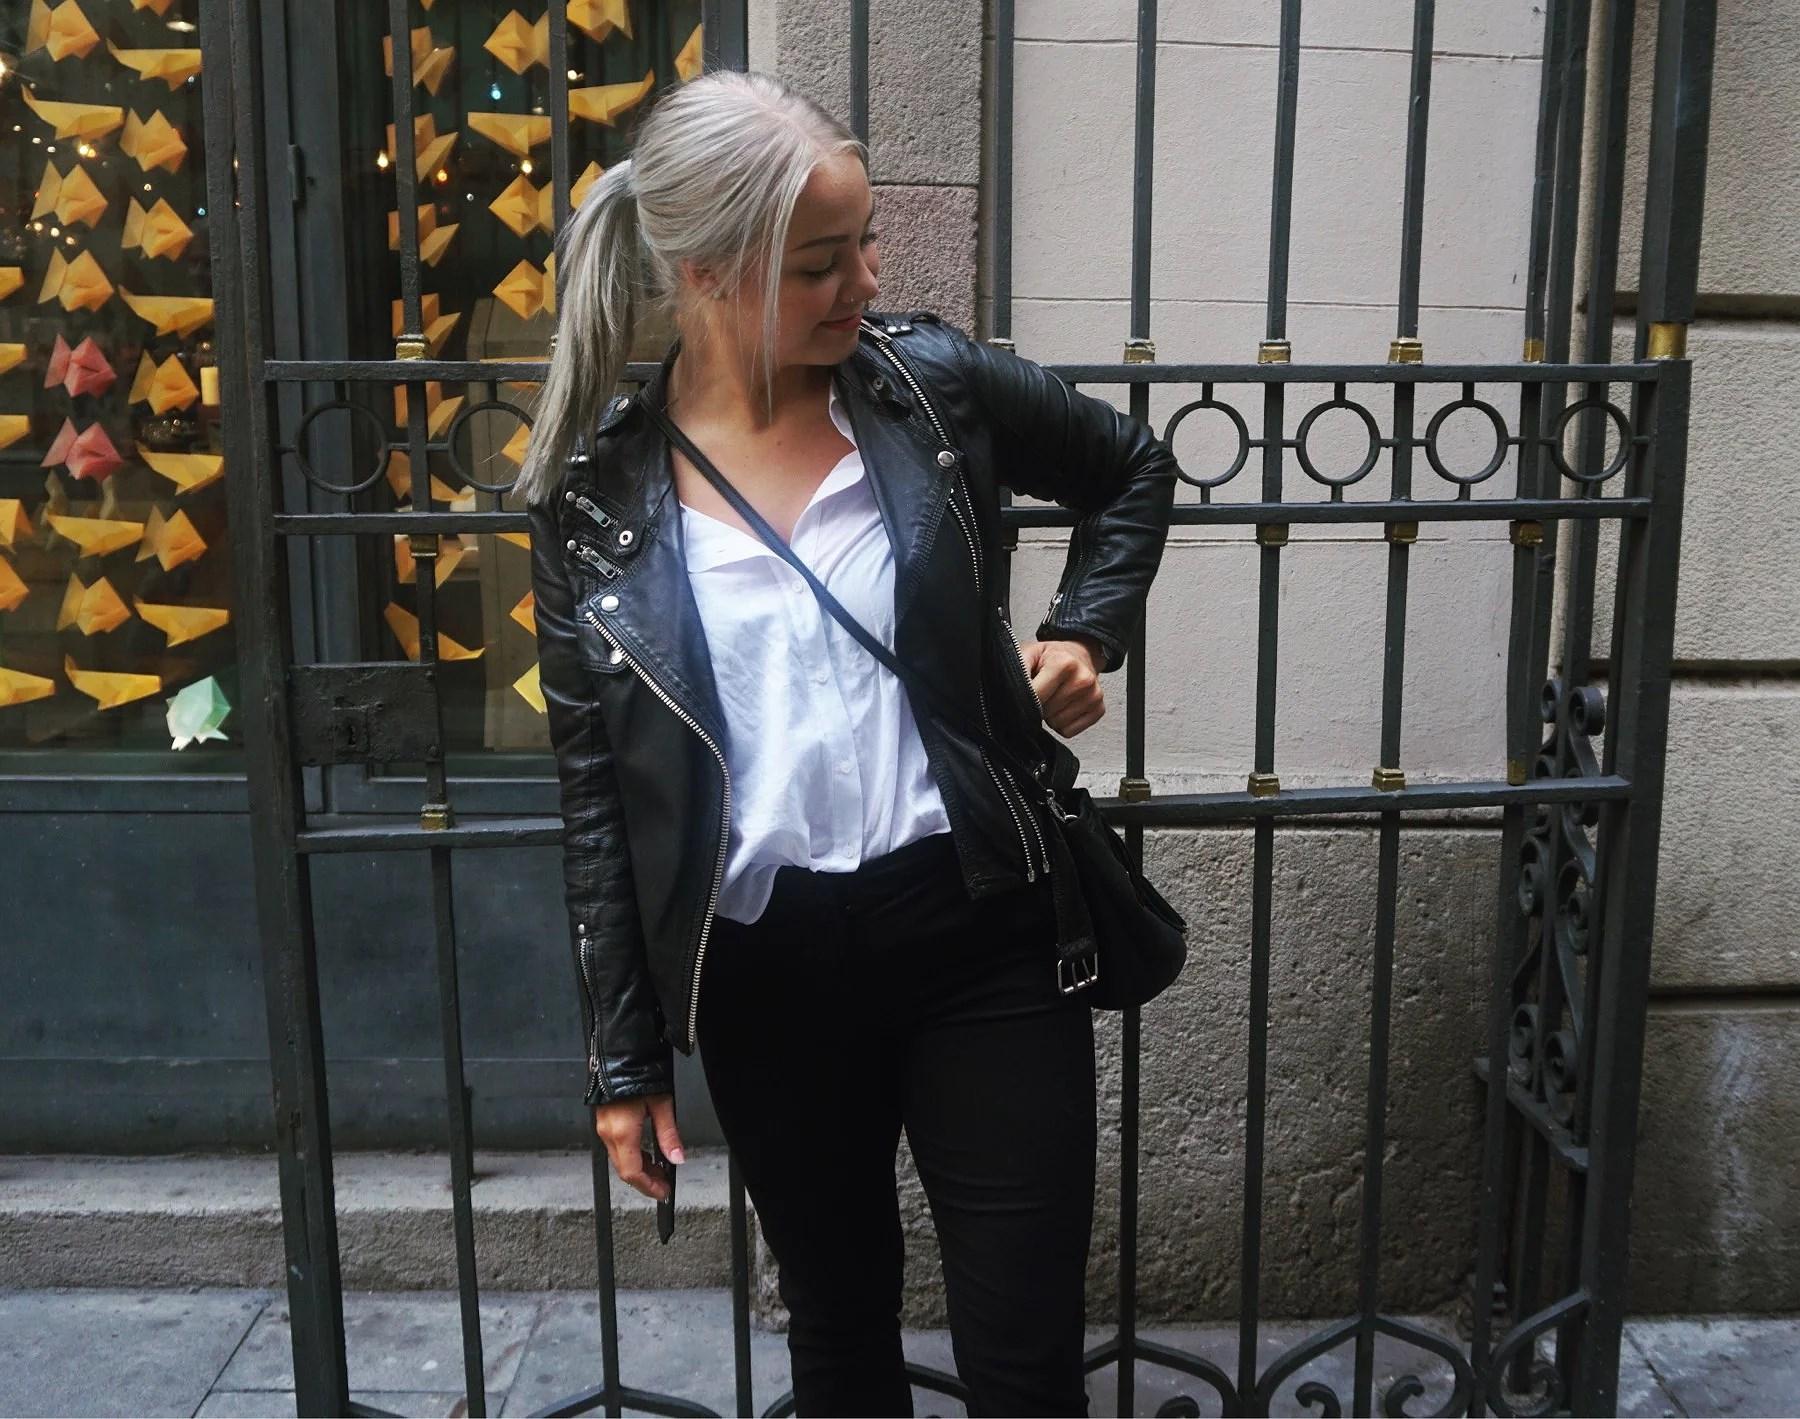 Barcelonas gator